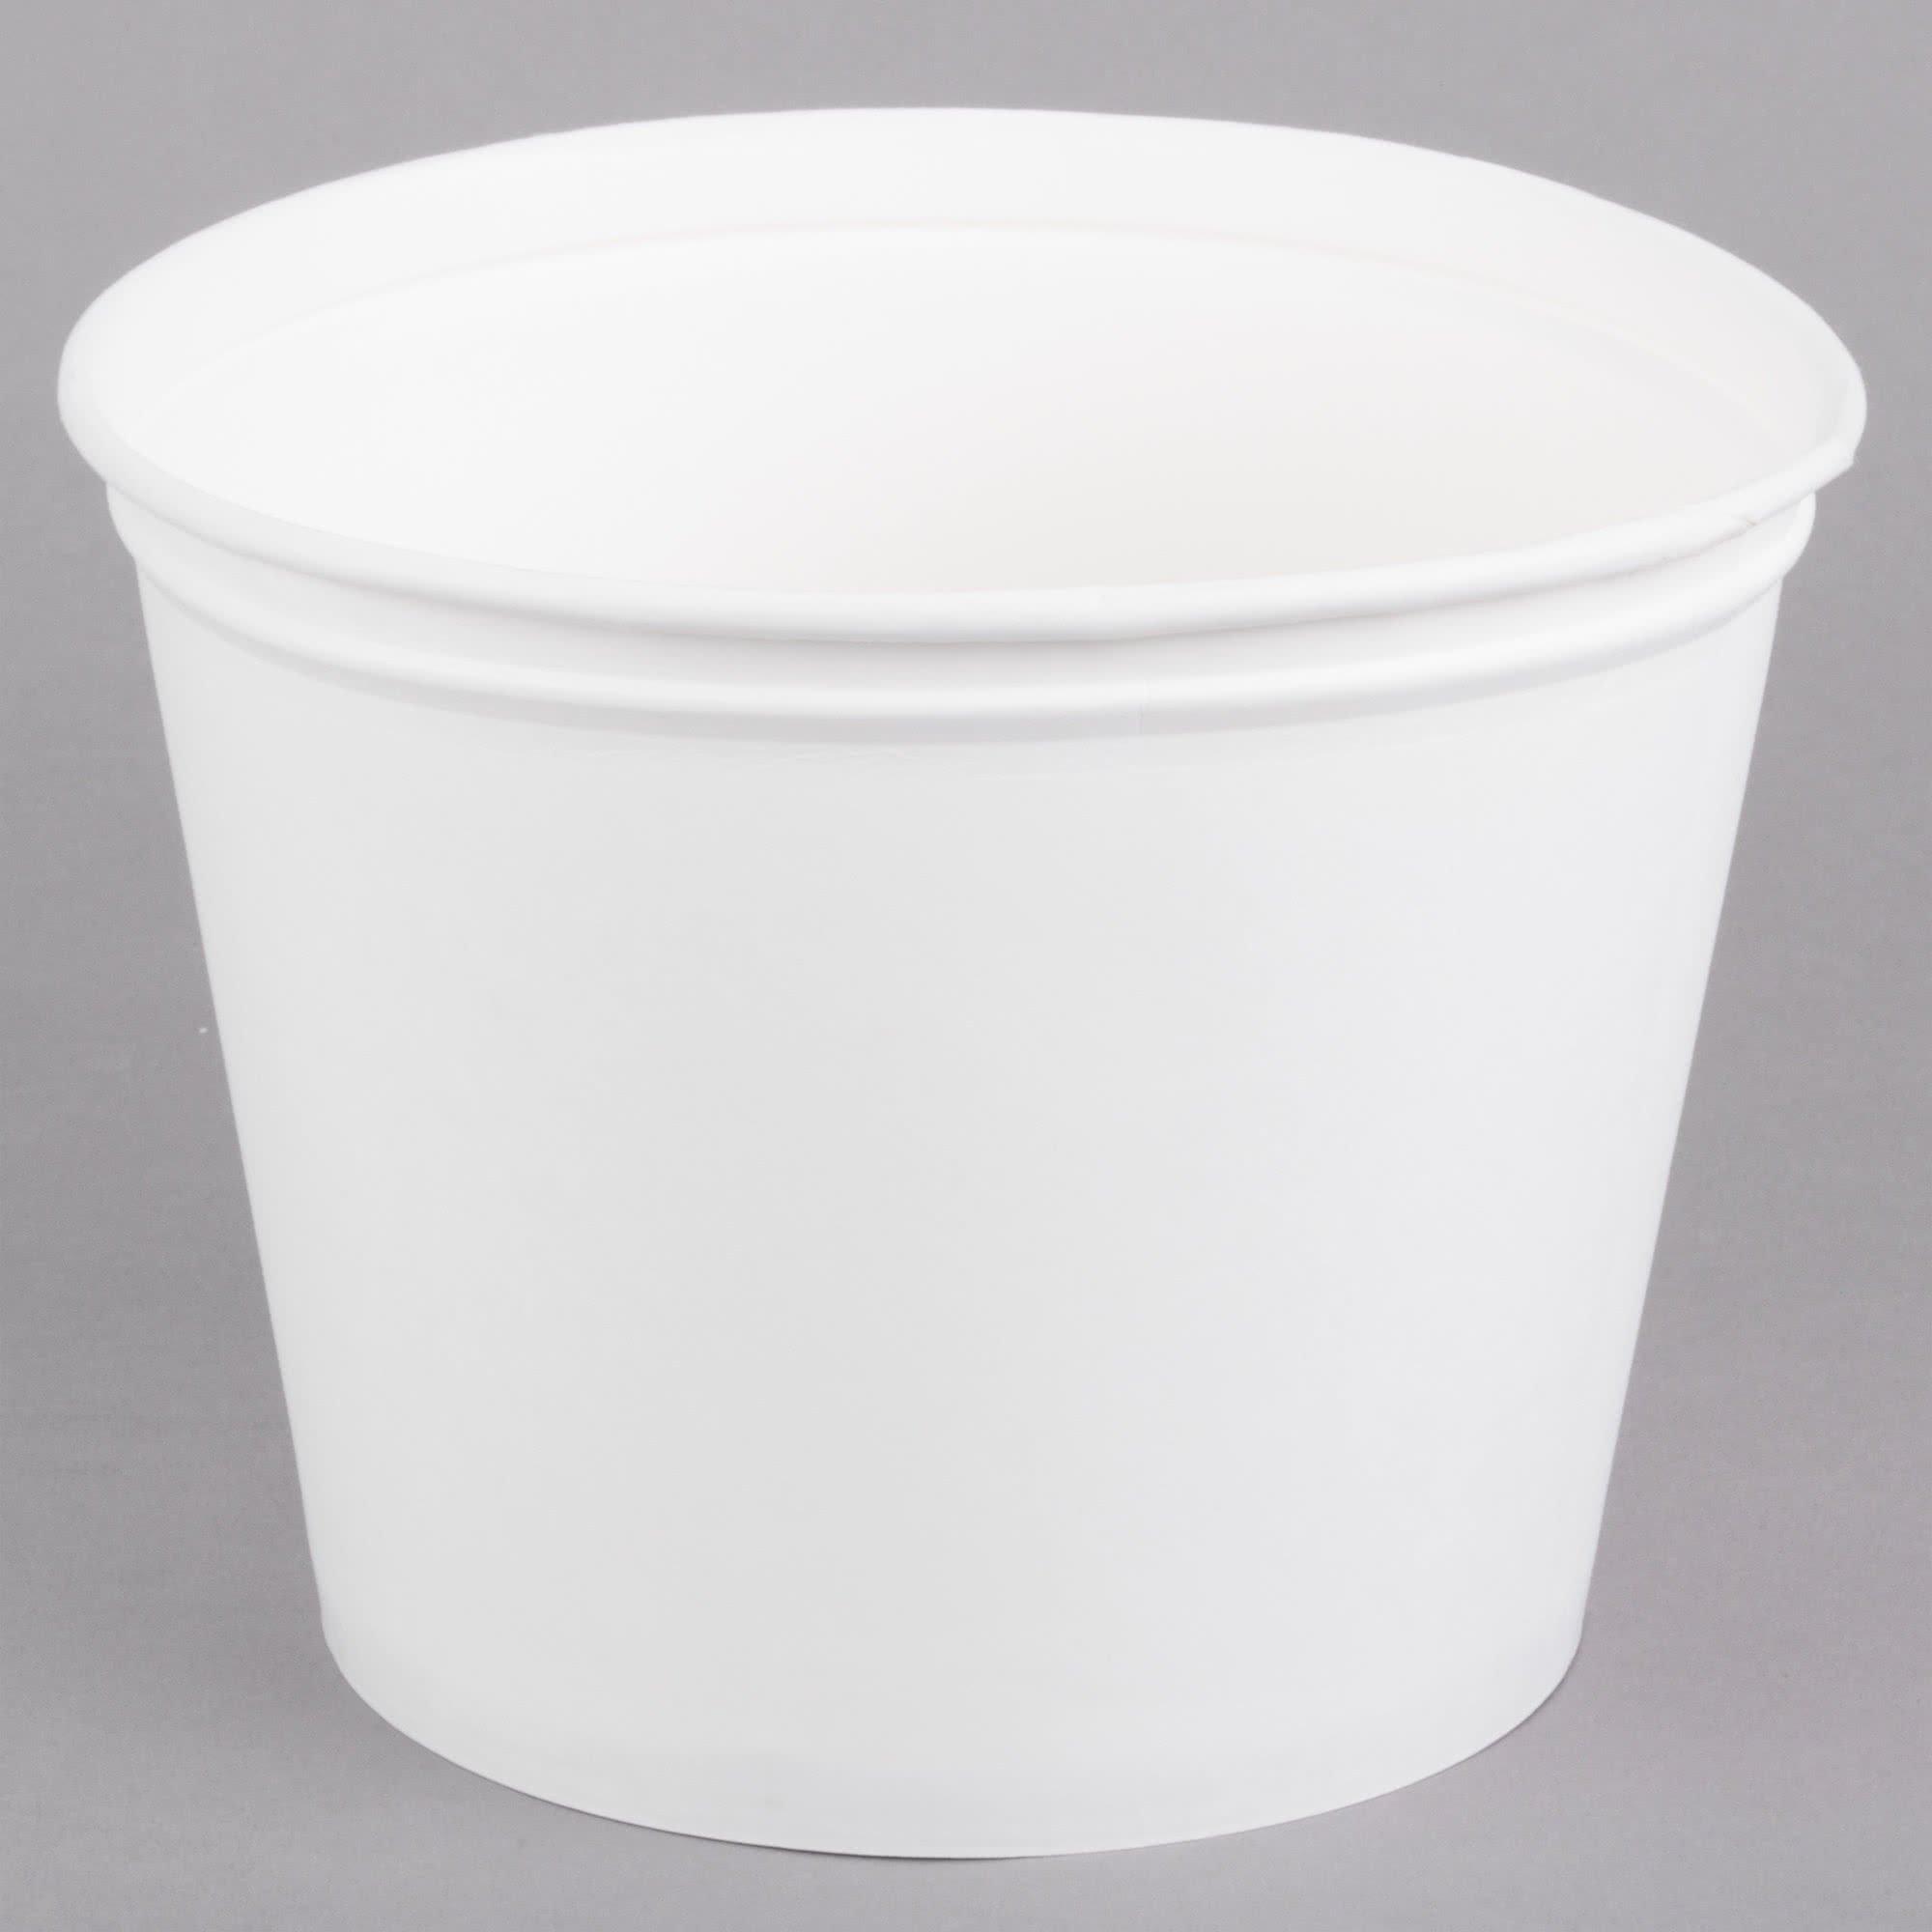 Dart Solo 5T1GR-02050 5 lb. White Paper Hot Food Bucket - 100/Case